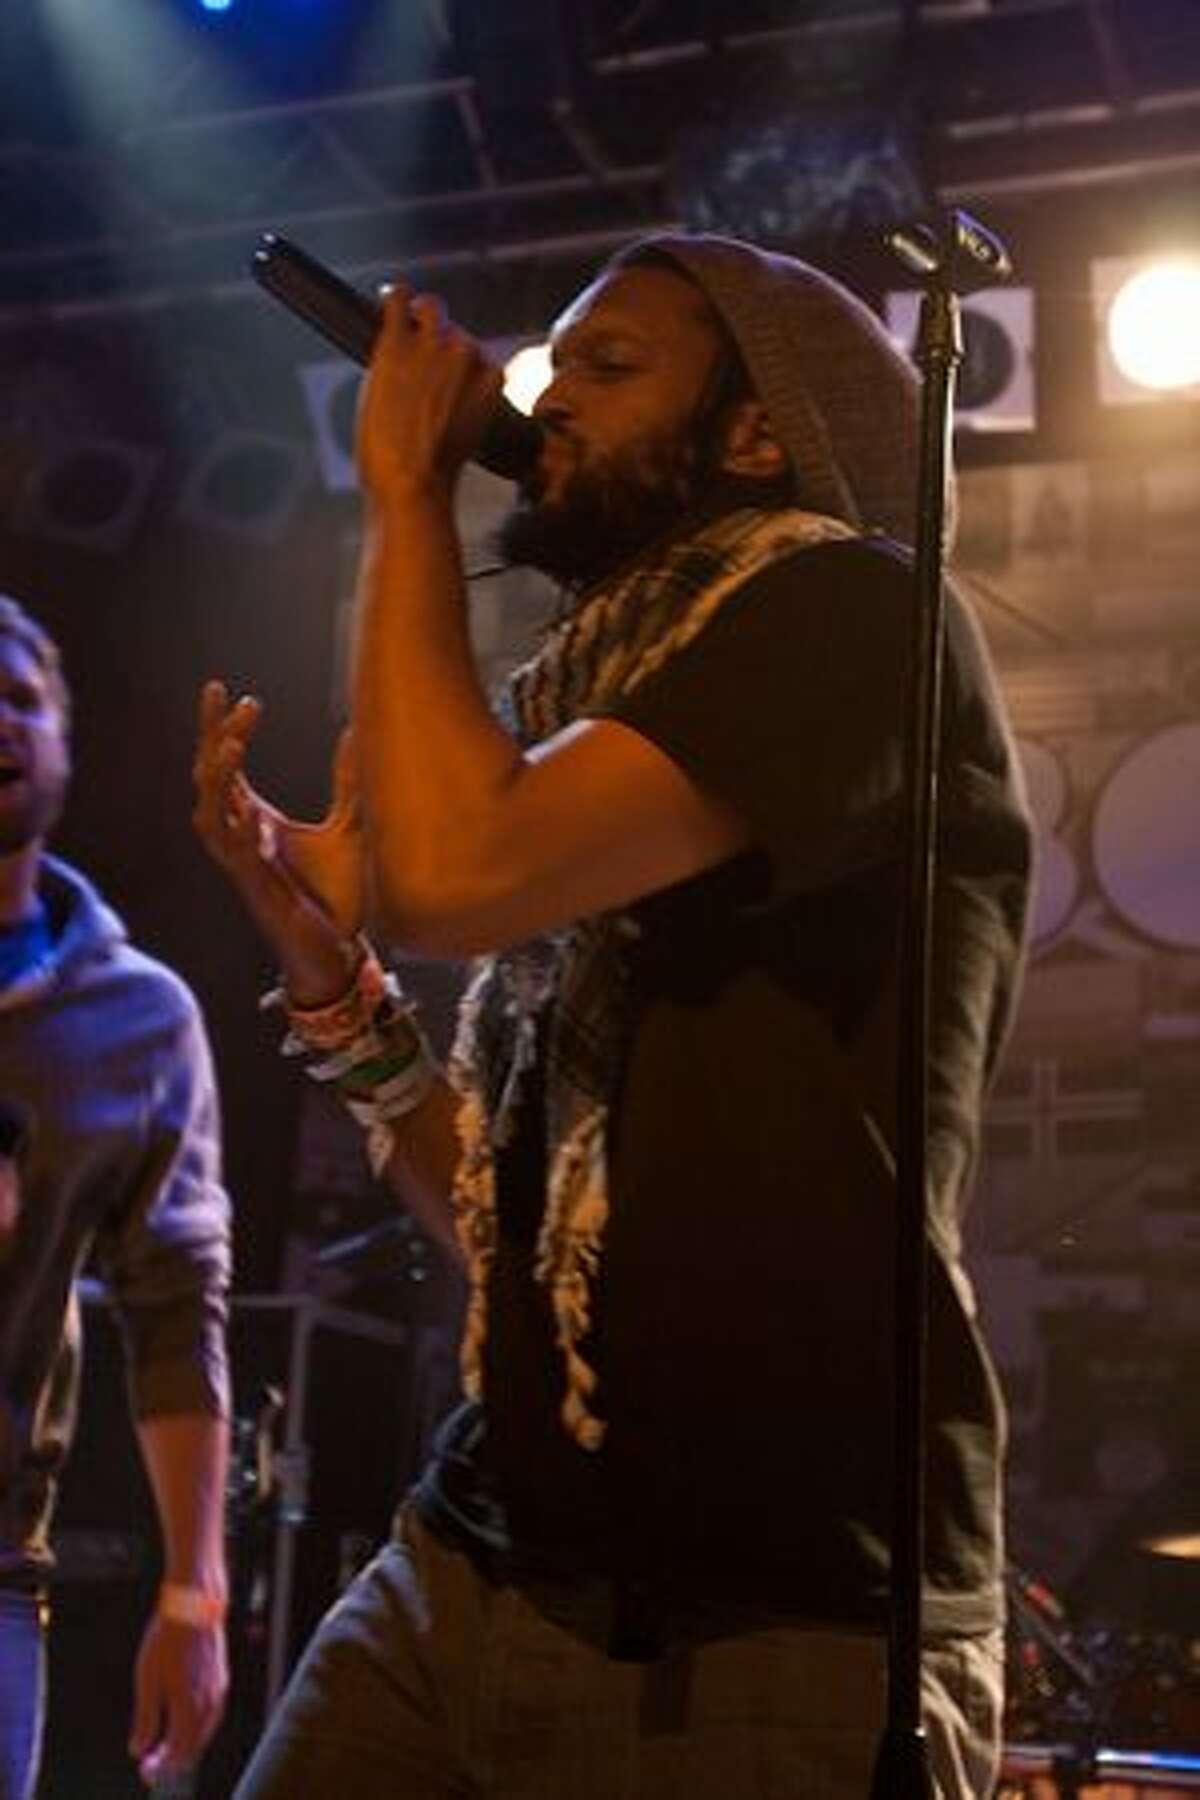 Denver hip-hop/rock group FLOBOTS performing at Neumos on May 9, 2010.